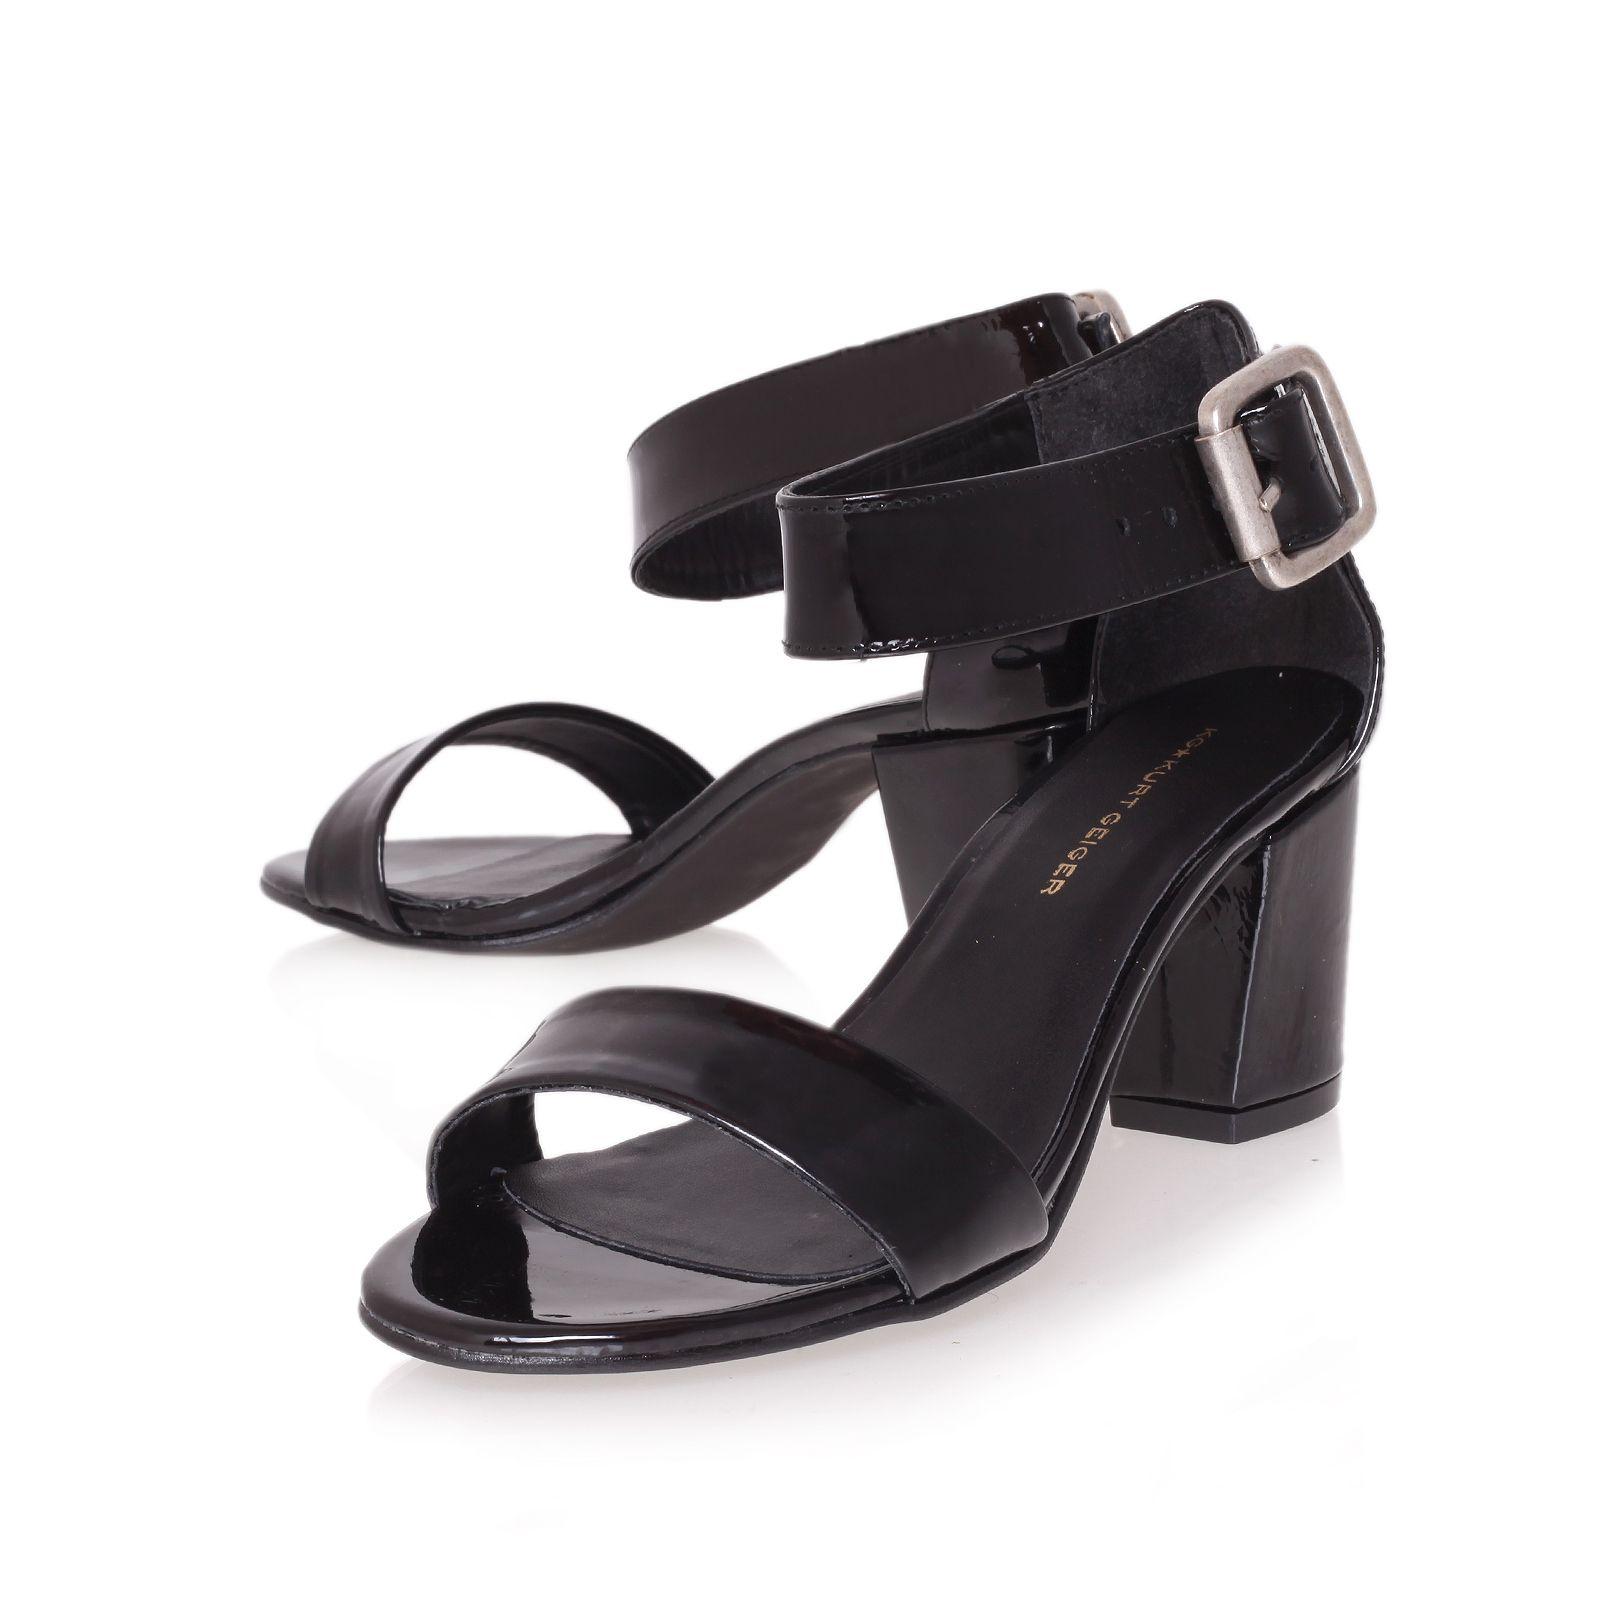 Black nina sandals - Gallery